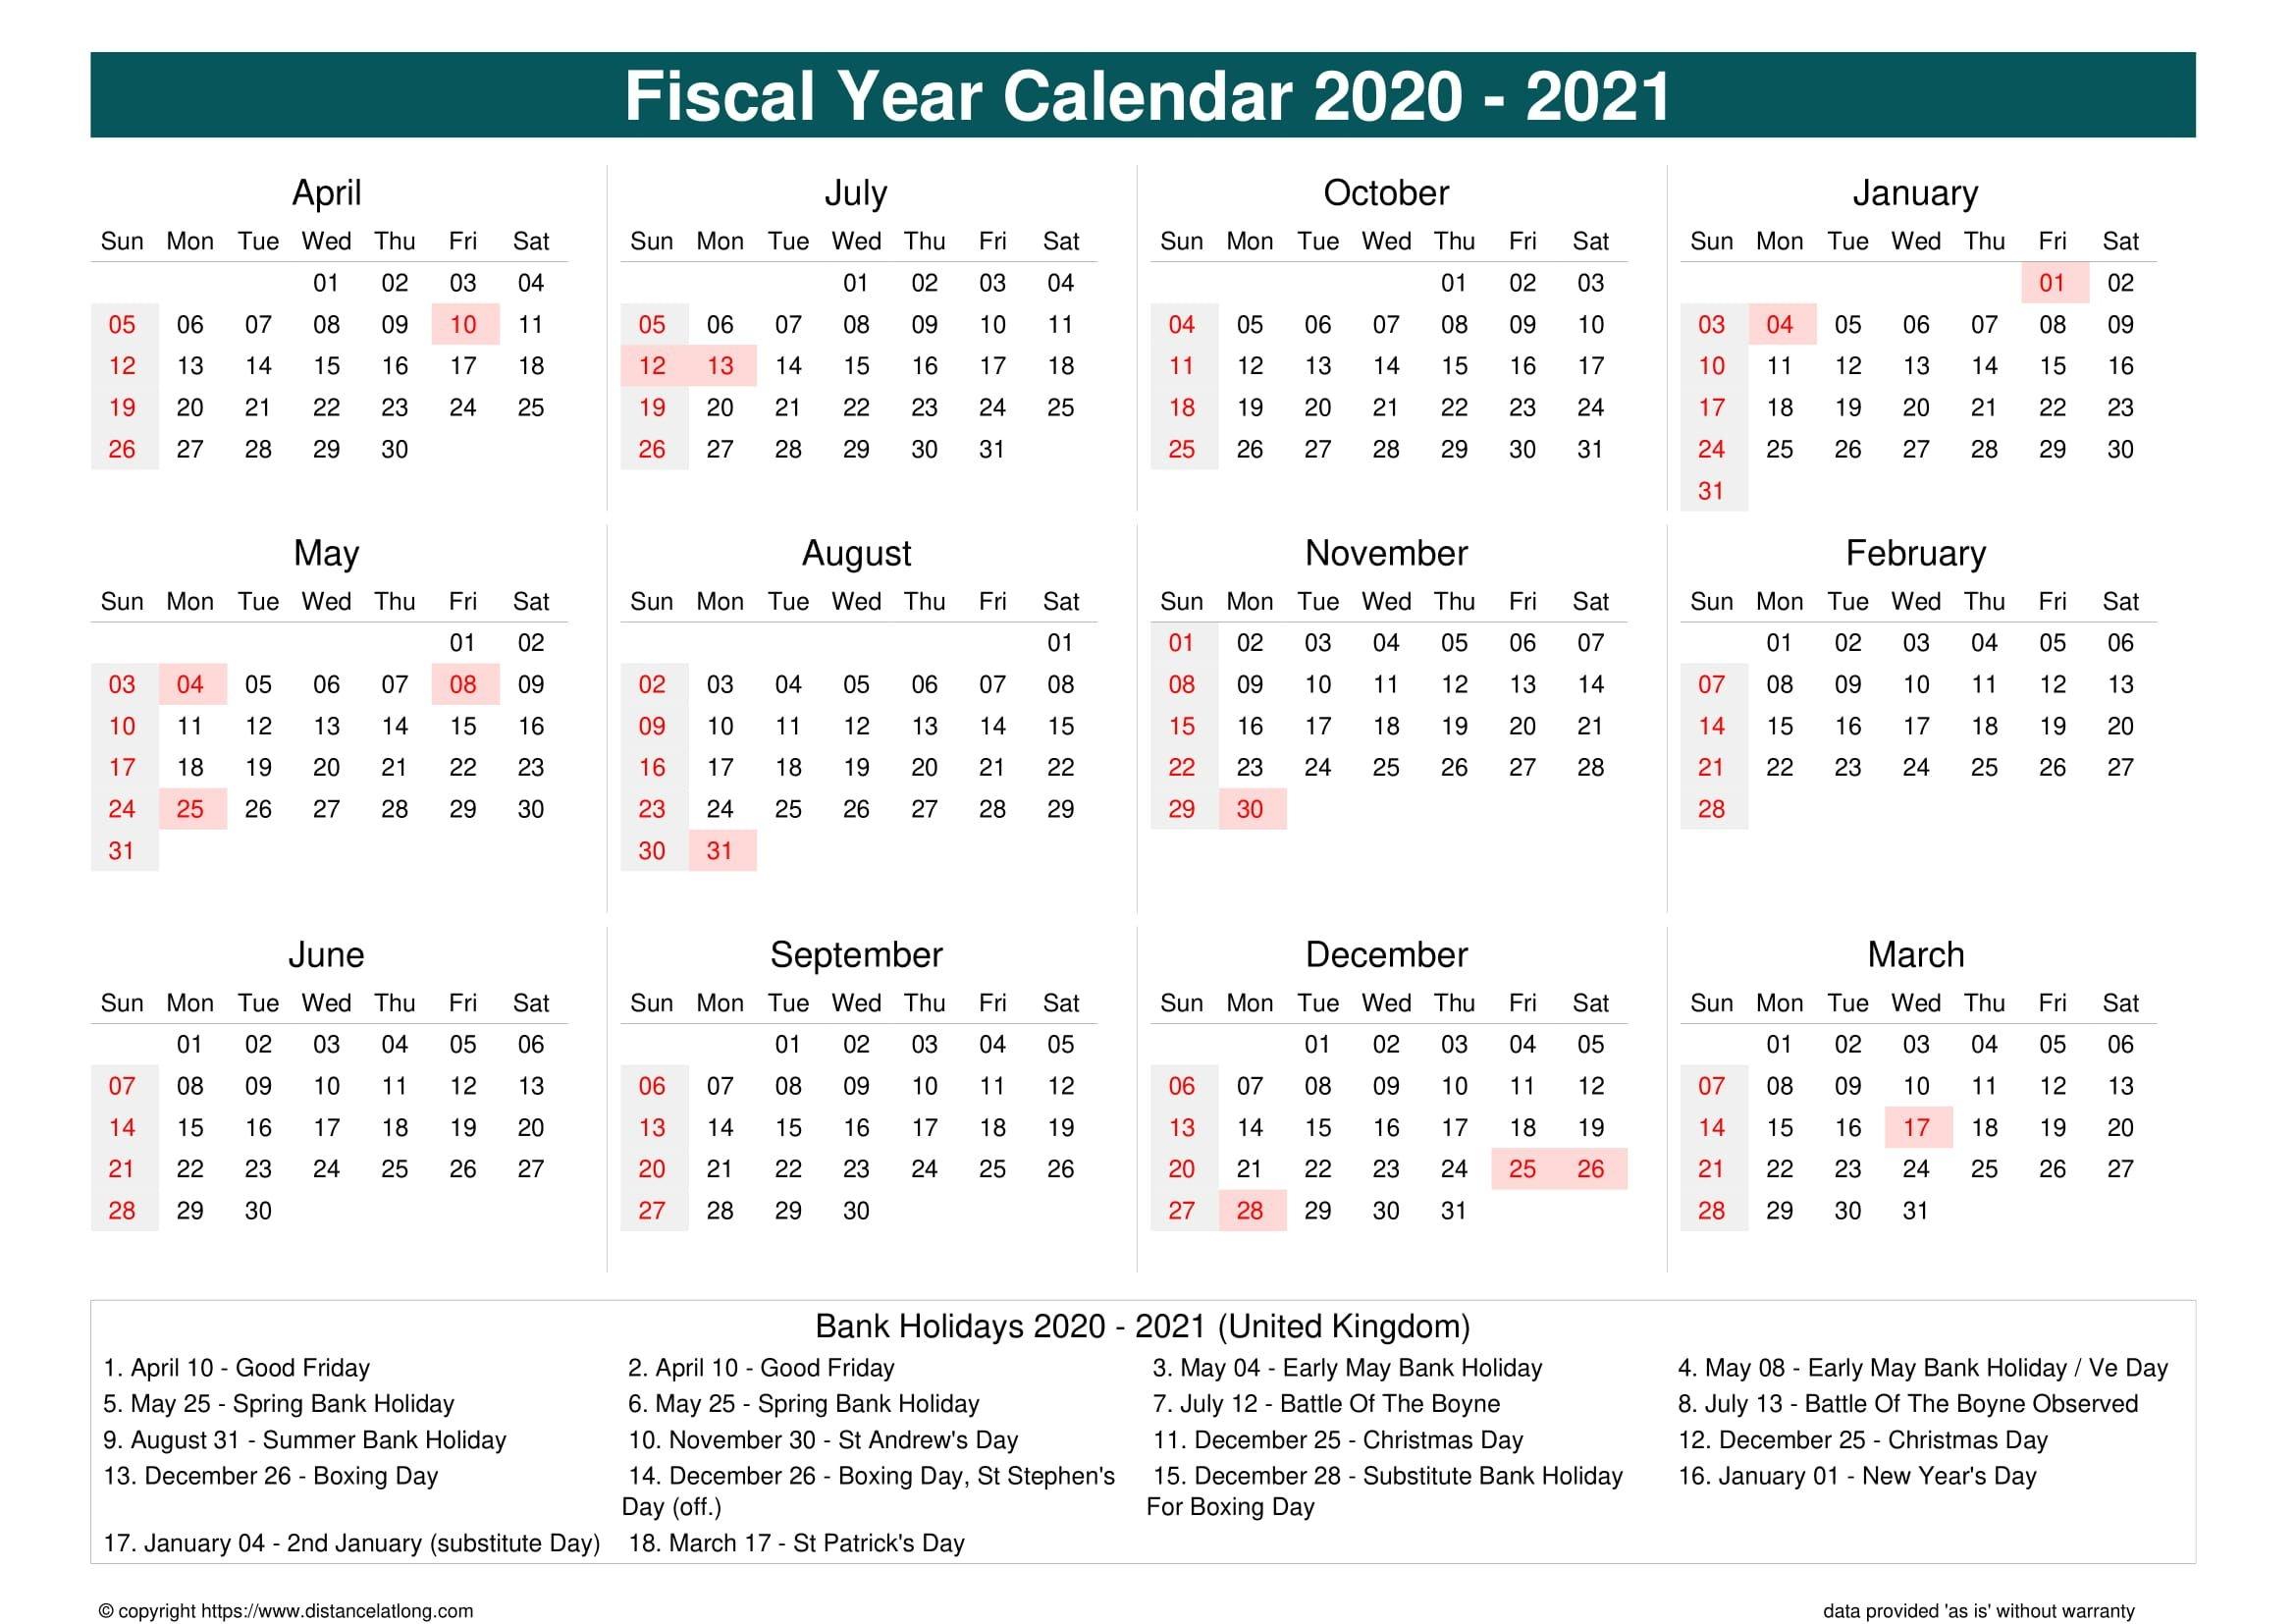 2021 Calendar With Bank Holidays - Example Calendar Printable